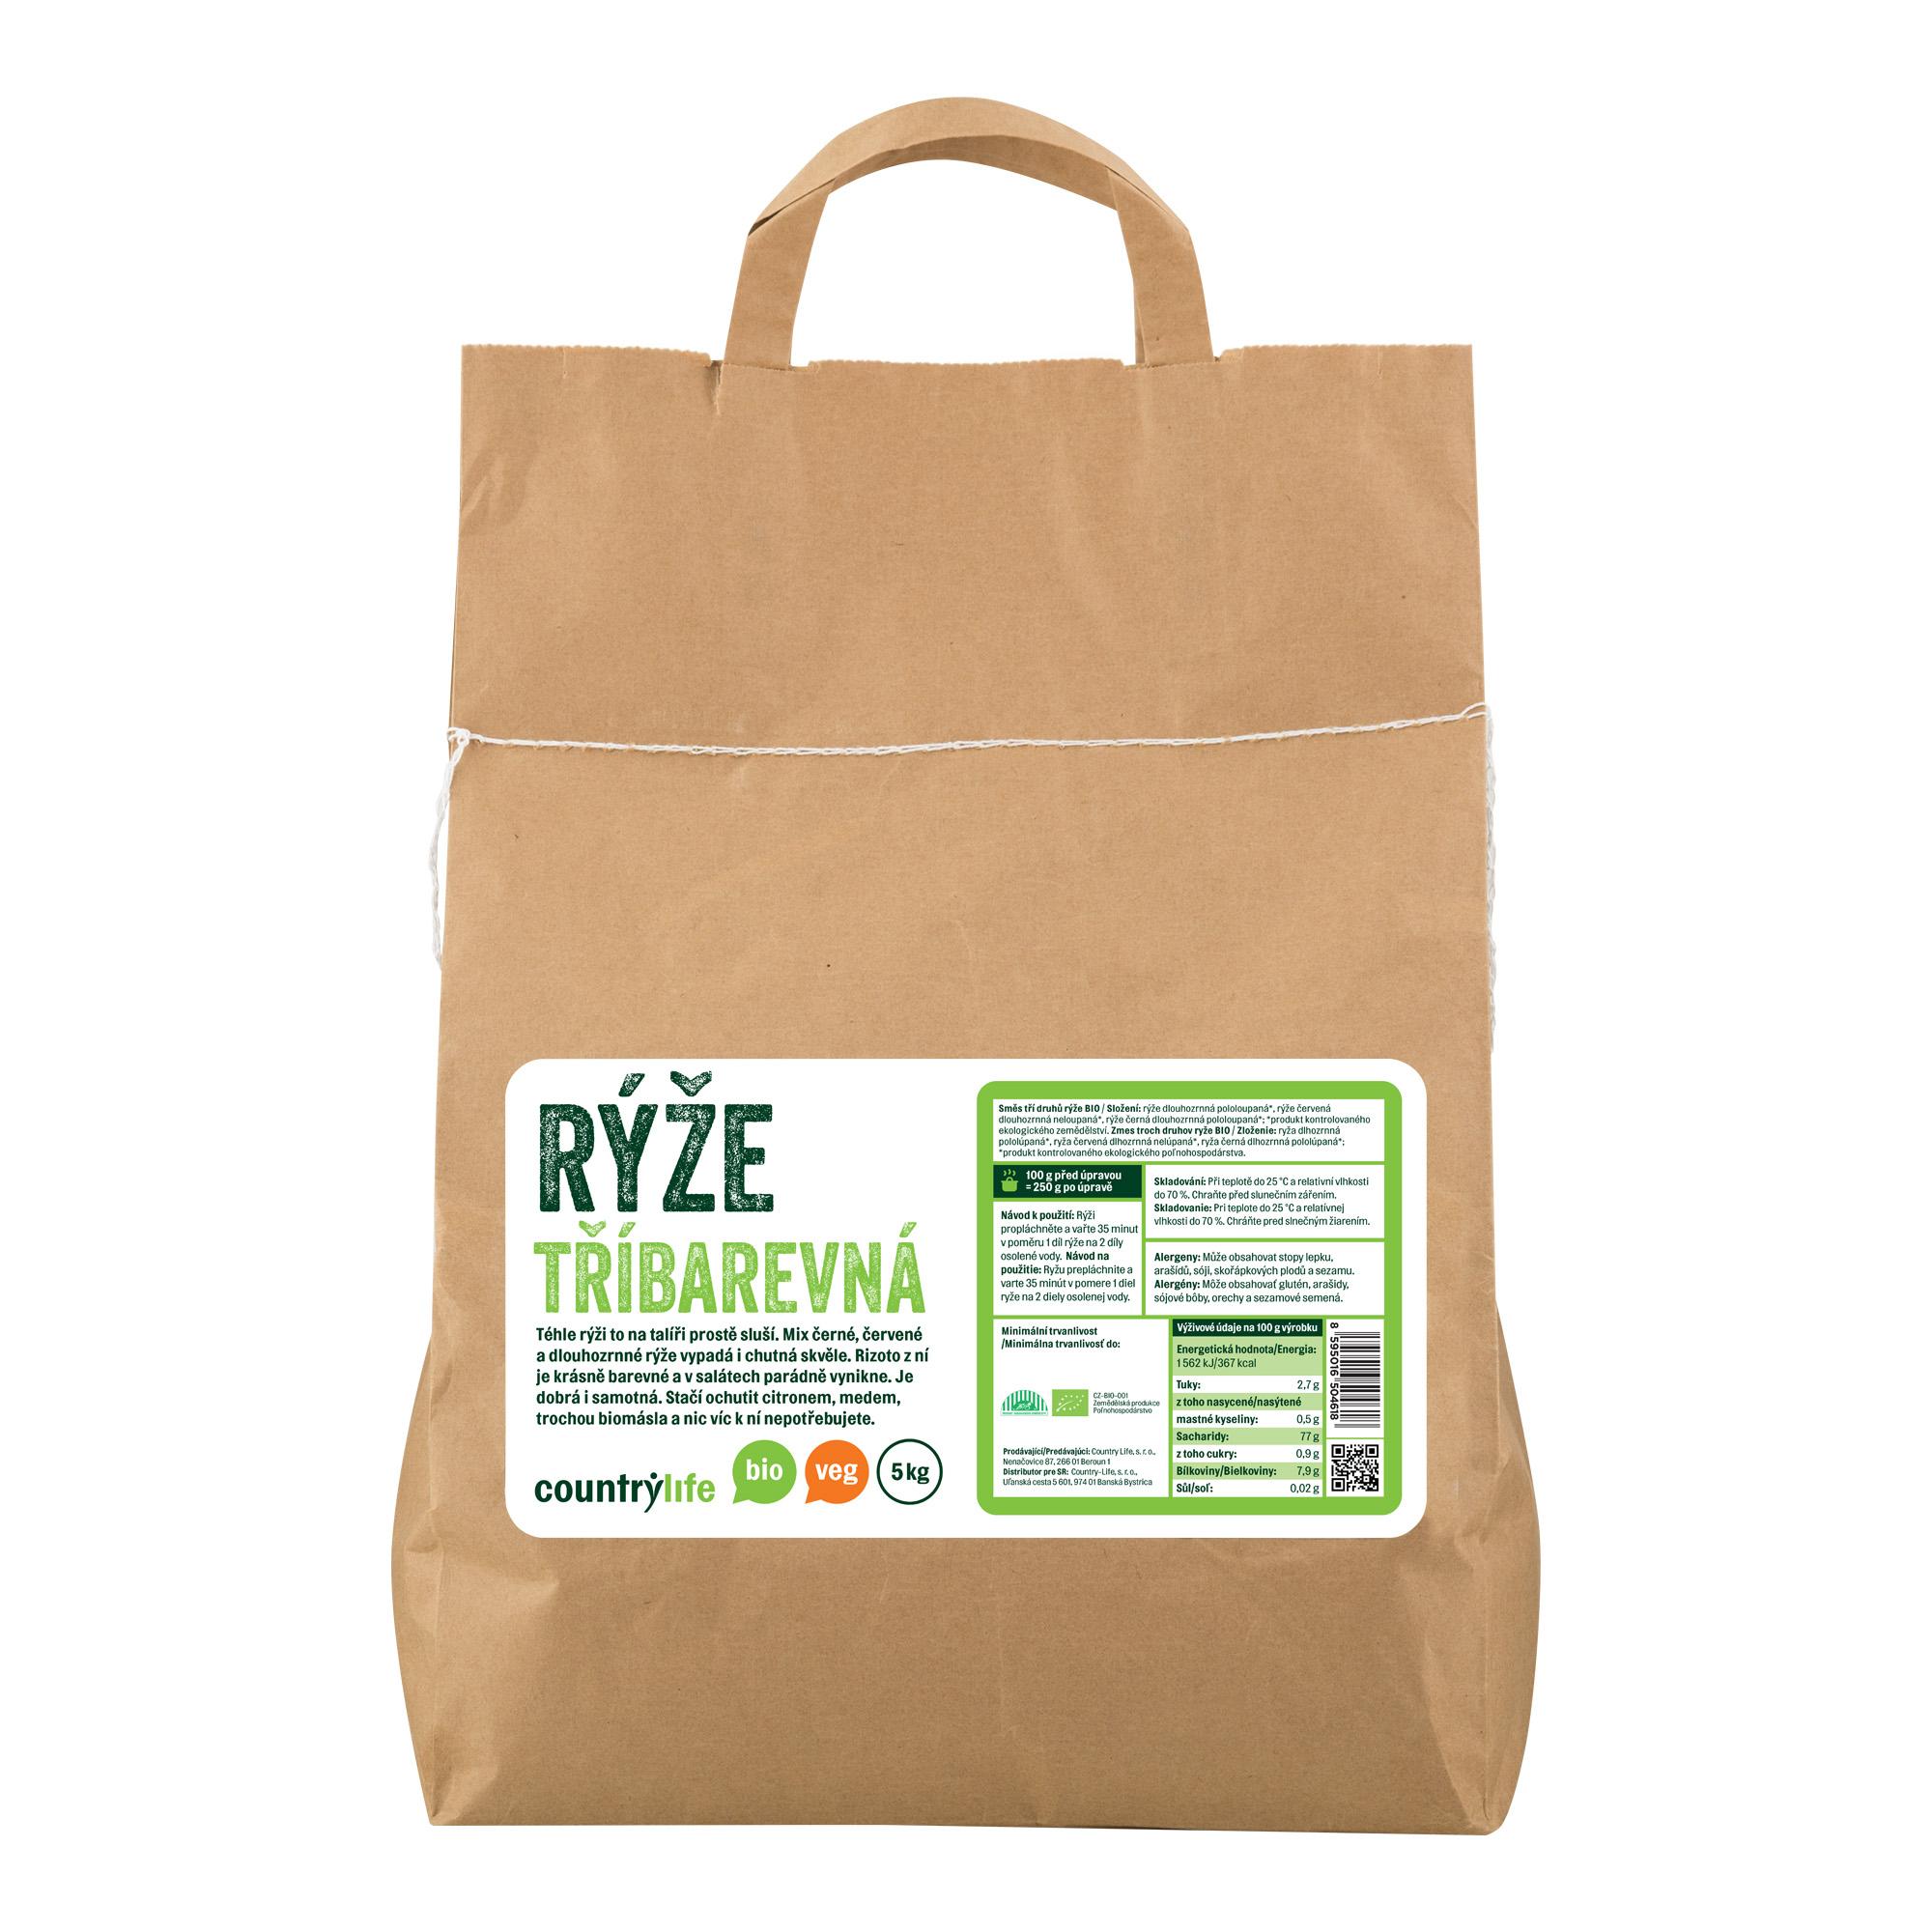 Rýže tříbarevná 5kg BIO   COUNTRYLIFE